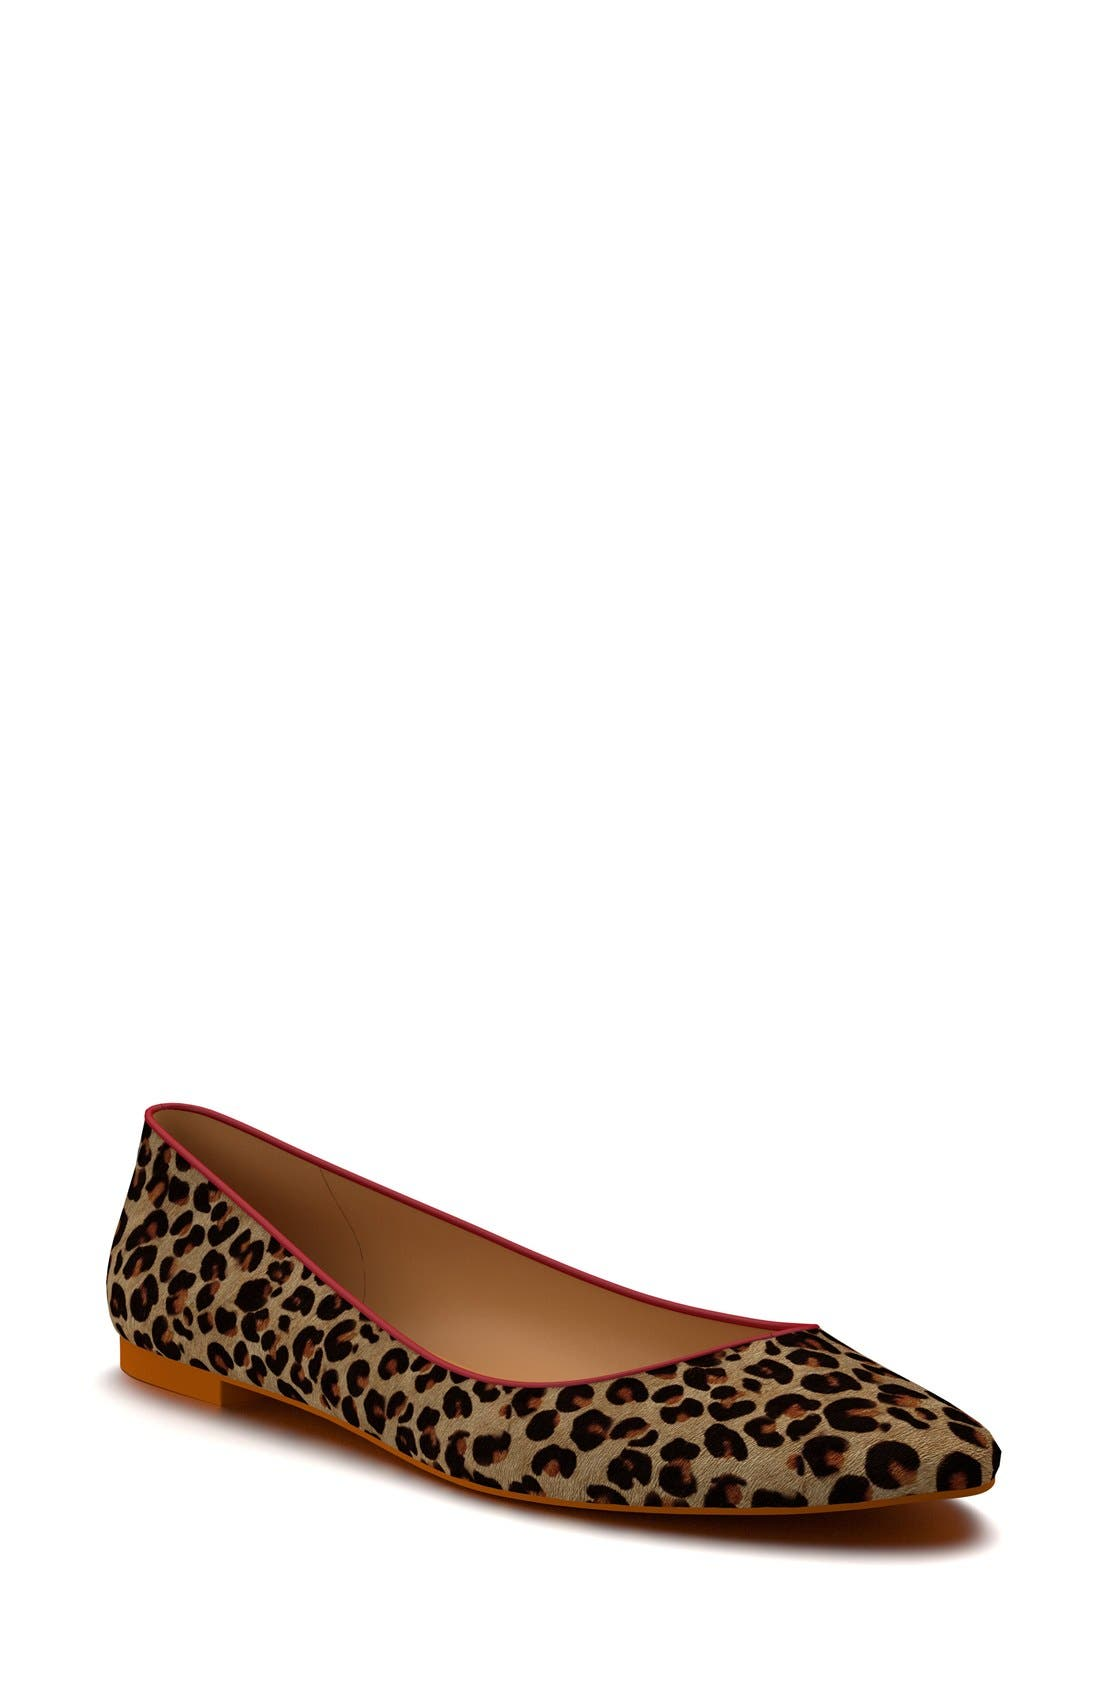 Shoes of Prey Genuine Calf Hair Ballet Flat (Women)